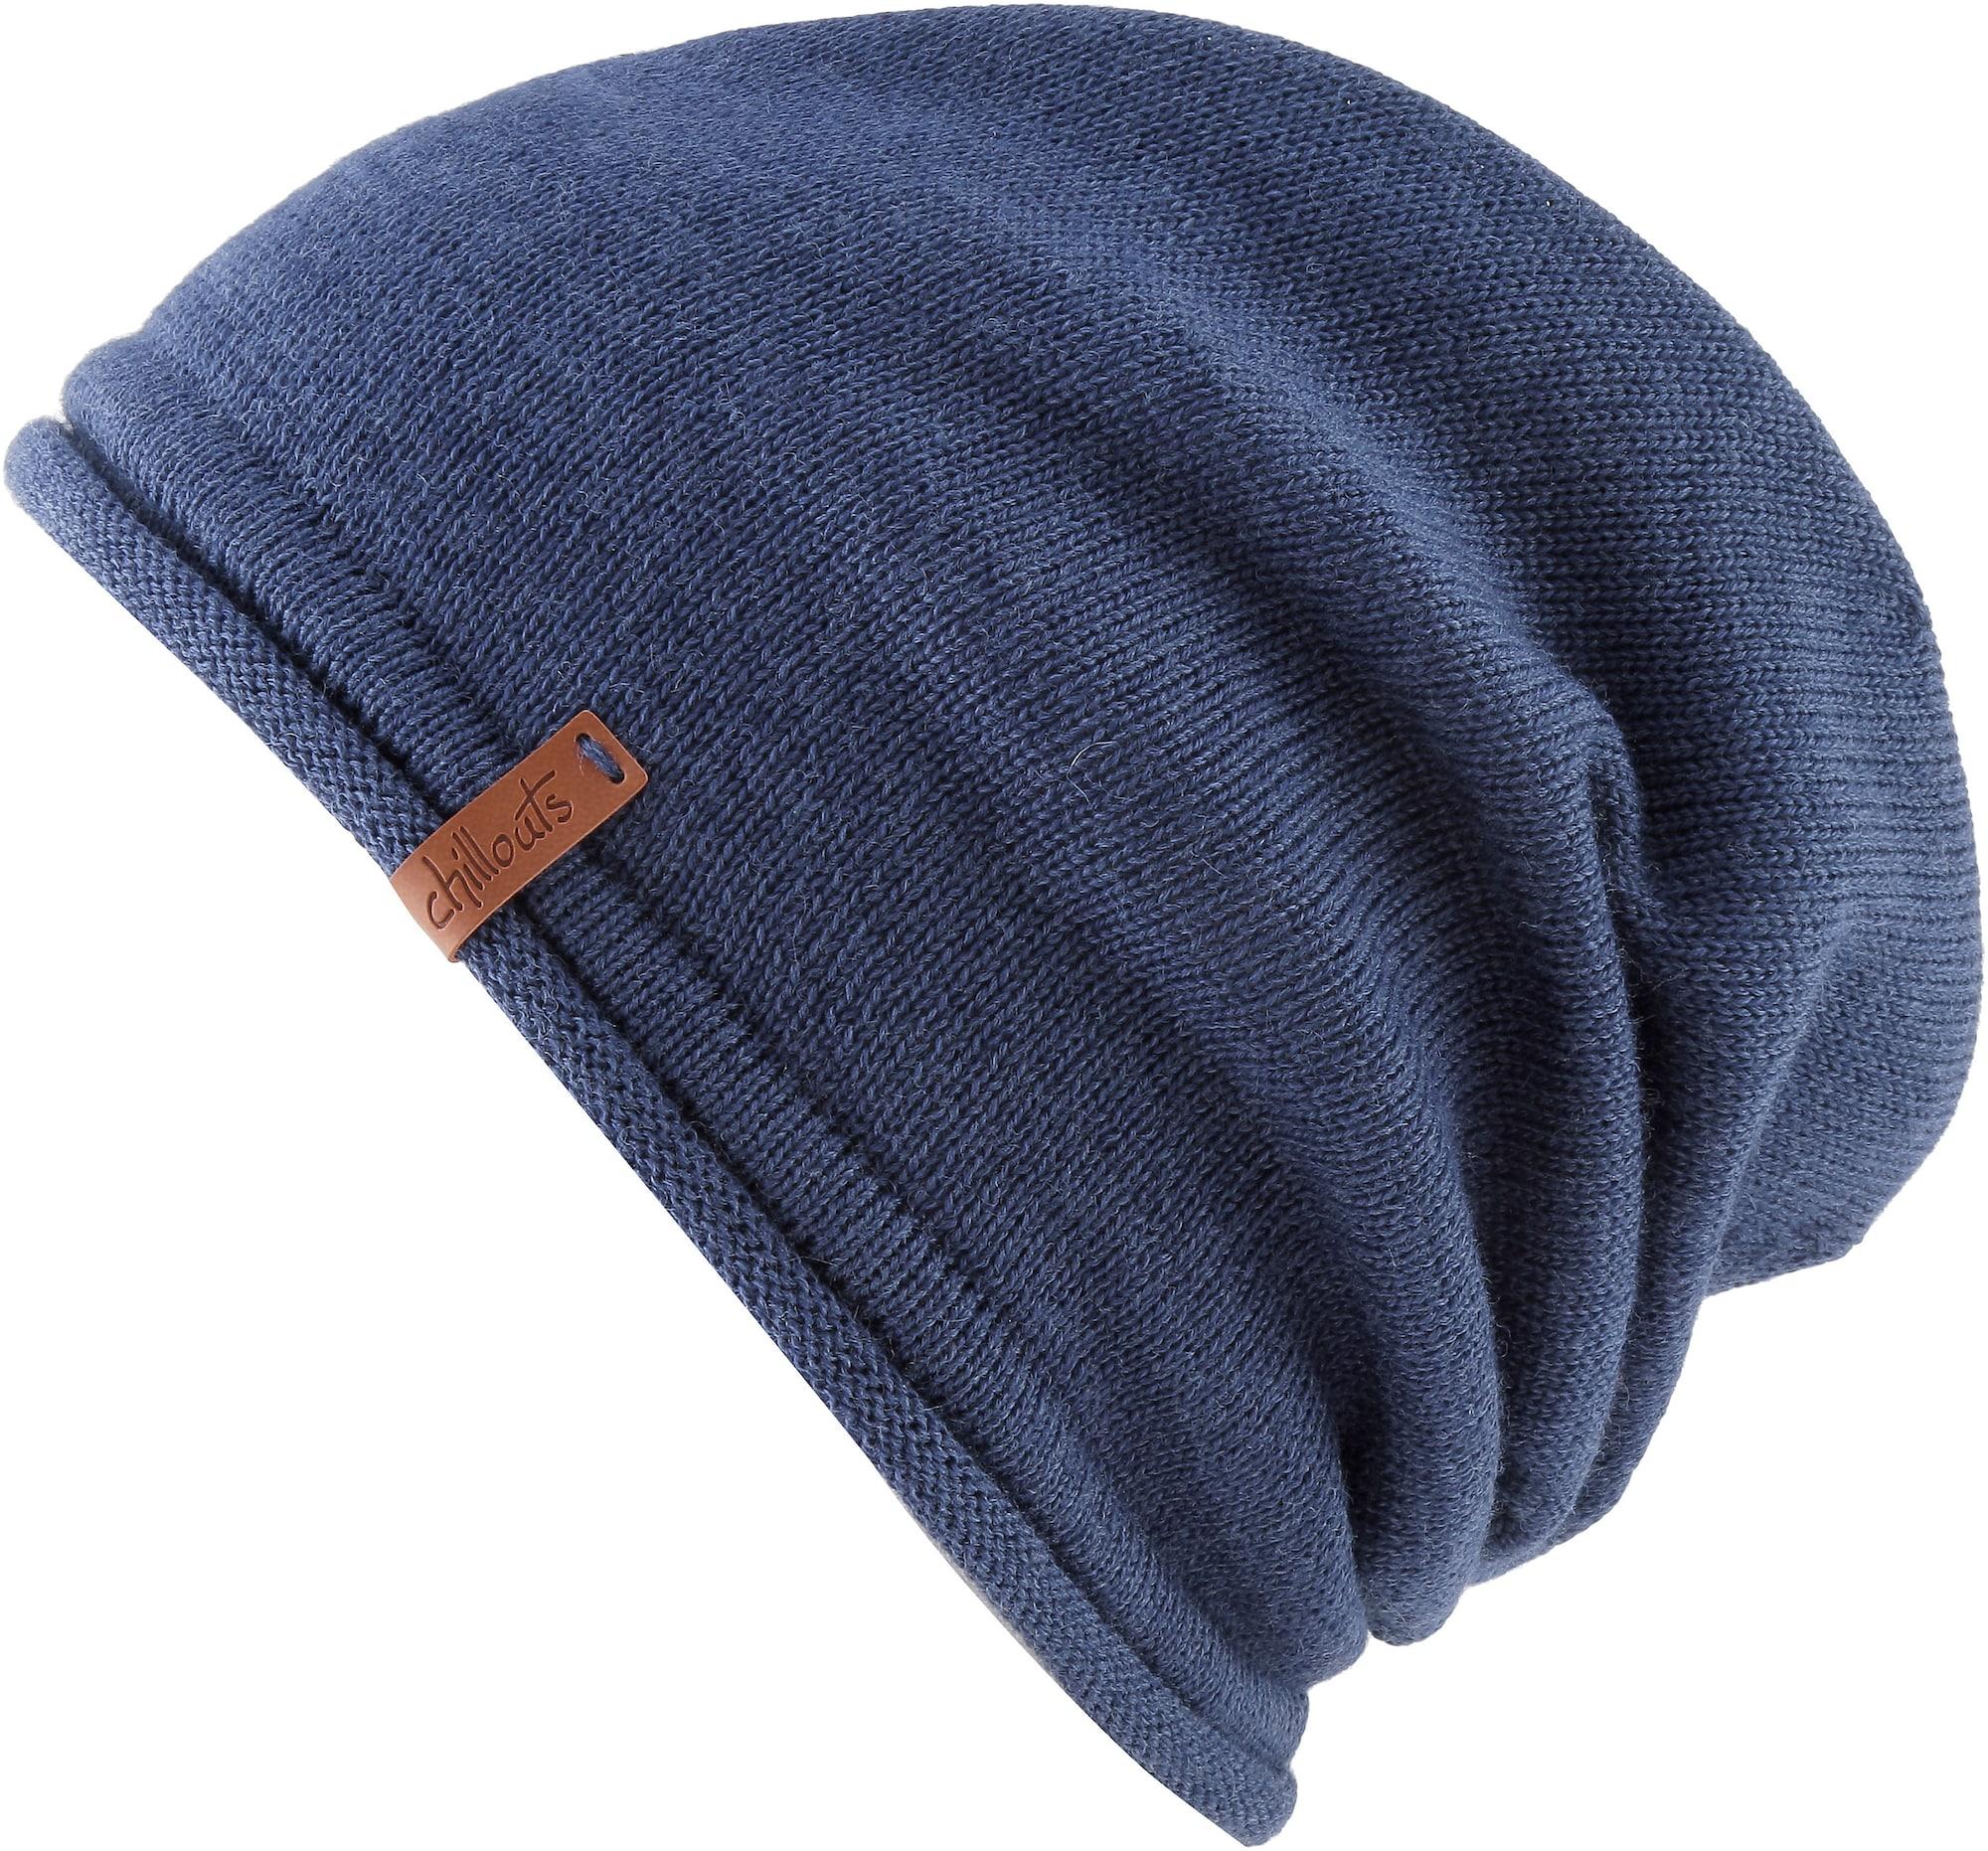 chillouts Megzta kepurė 'Leicester' mėlyna